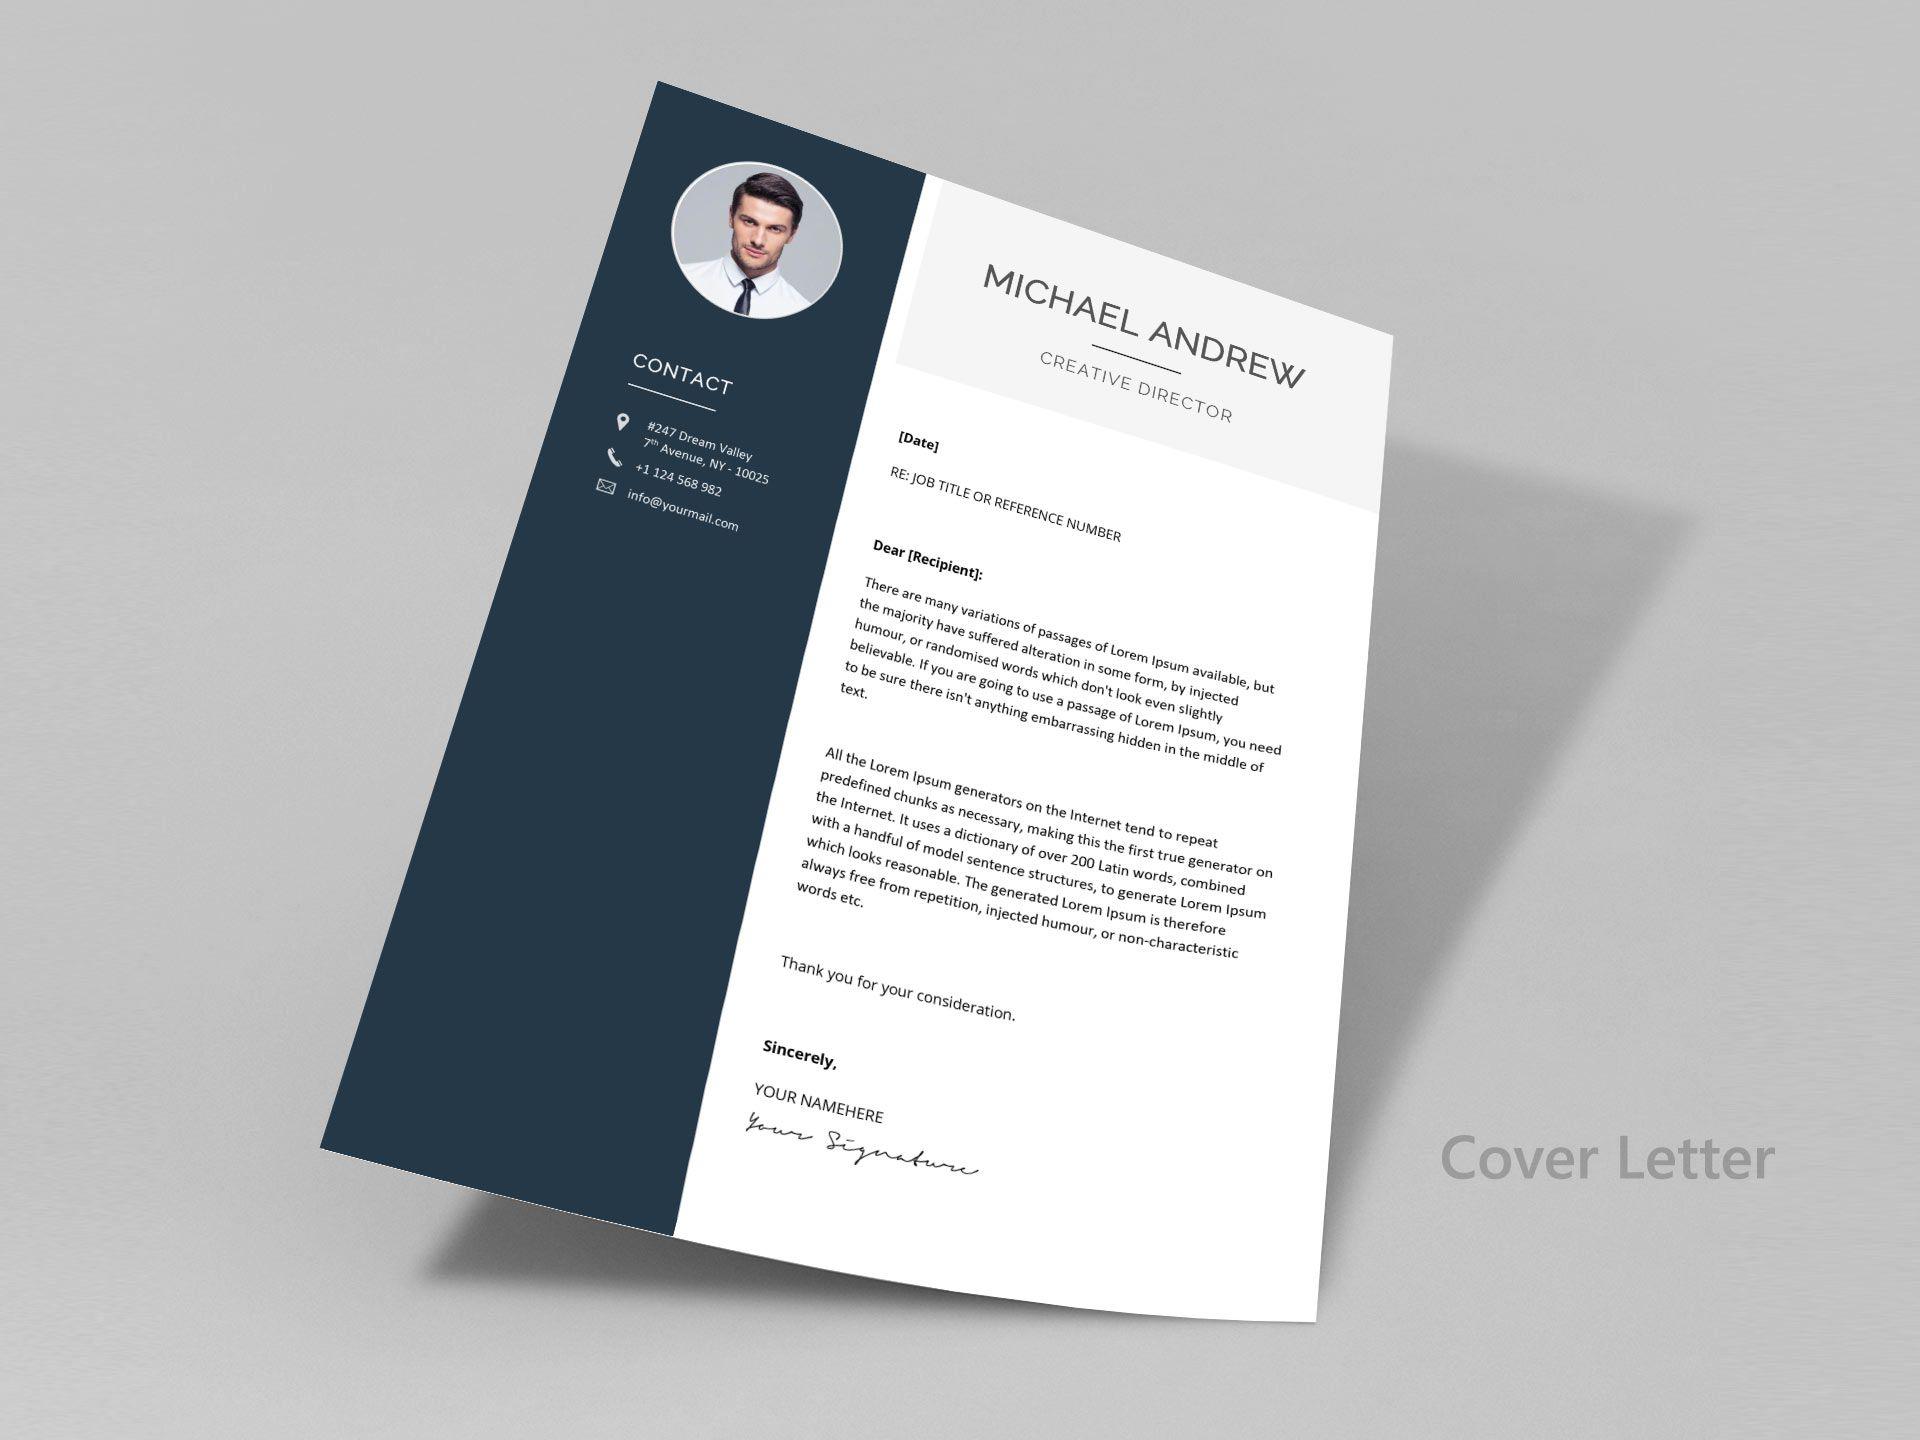 004 Wondrou Download Elegant Resume Template Microsoft Word Highest Clarity Full